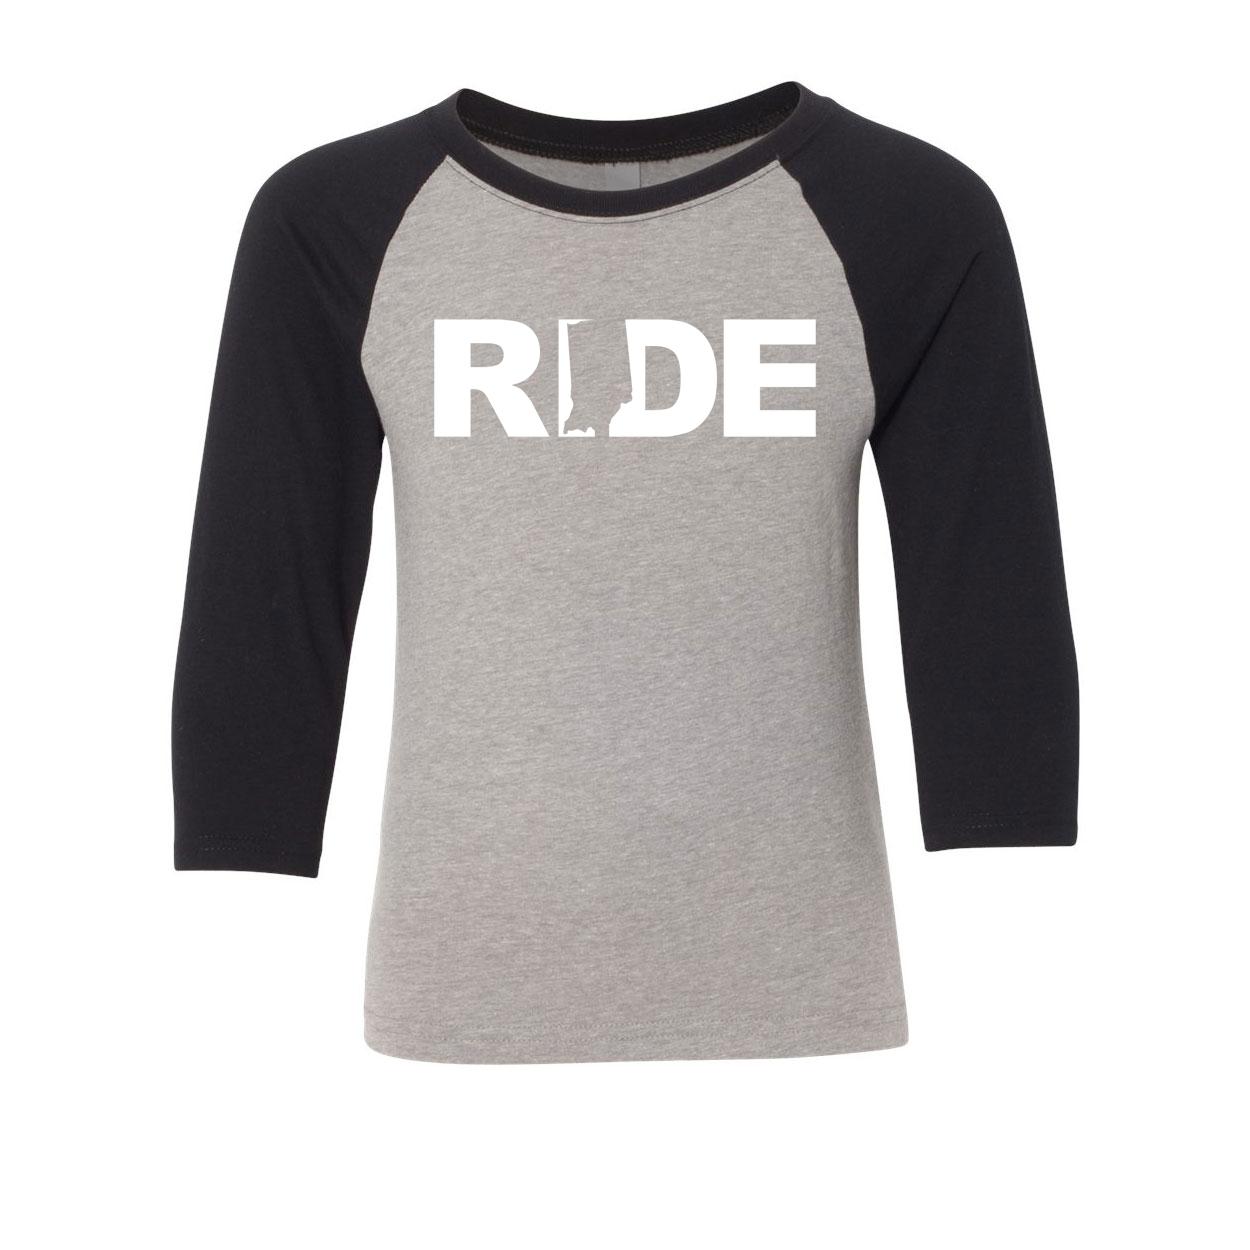 Ride Indiana Classic Youth Premium Raglan Shirt Gray/Black (White Logo)